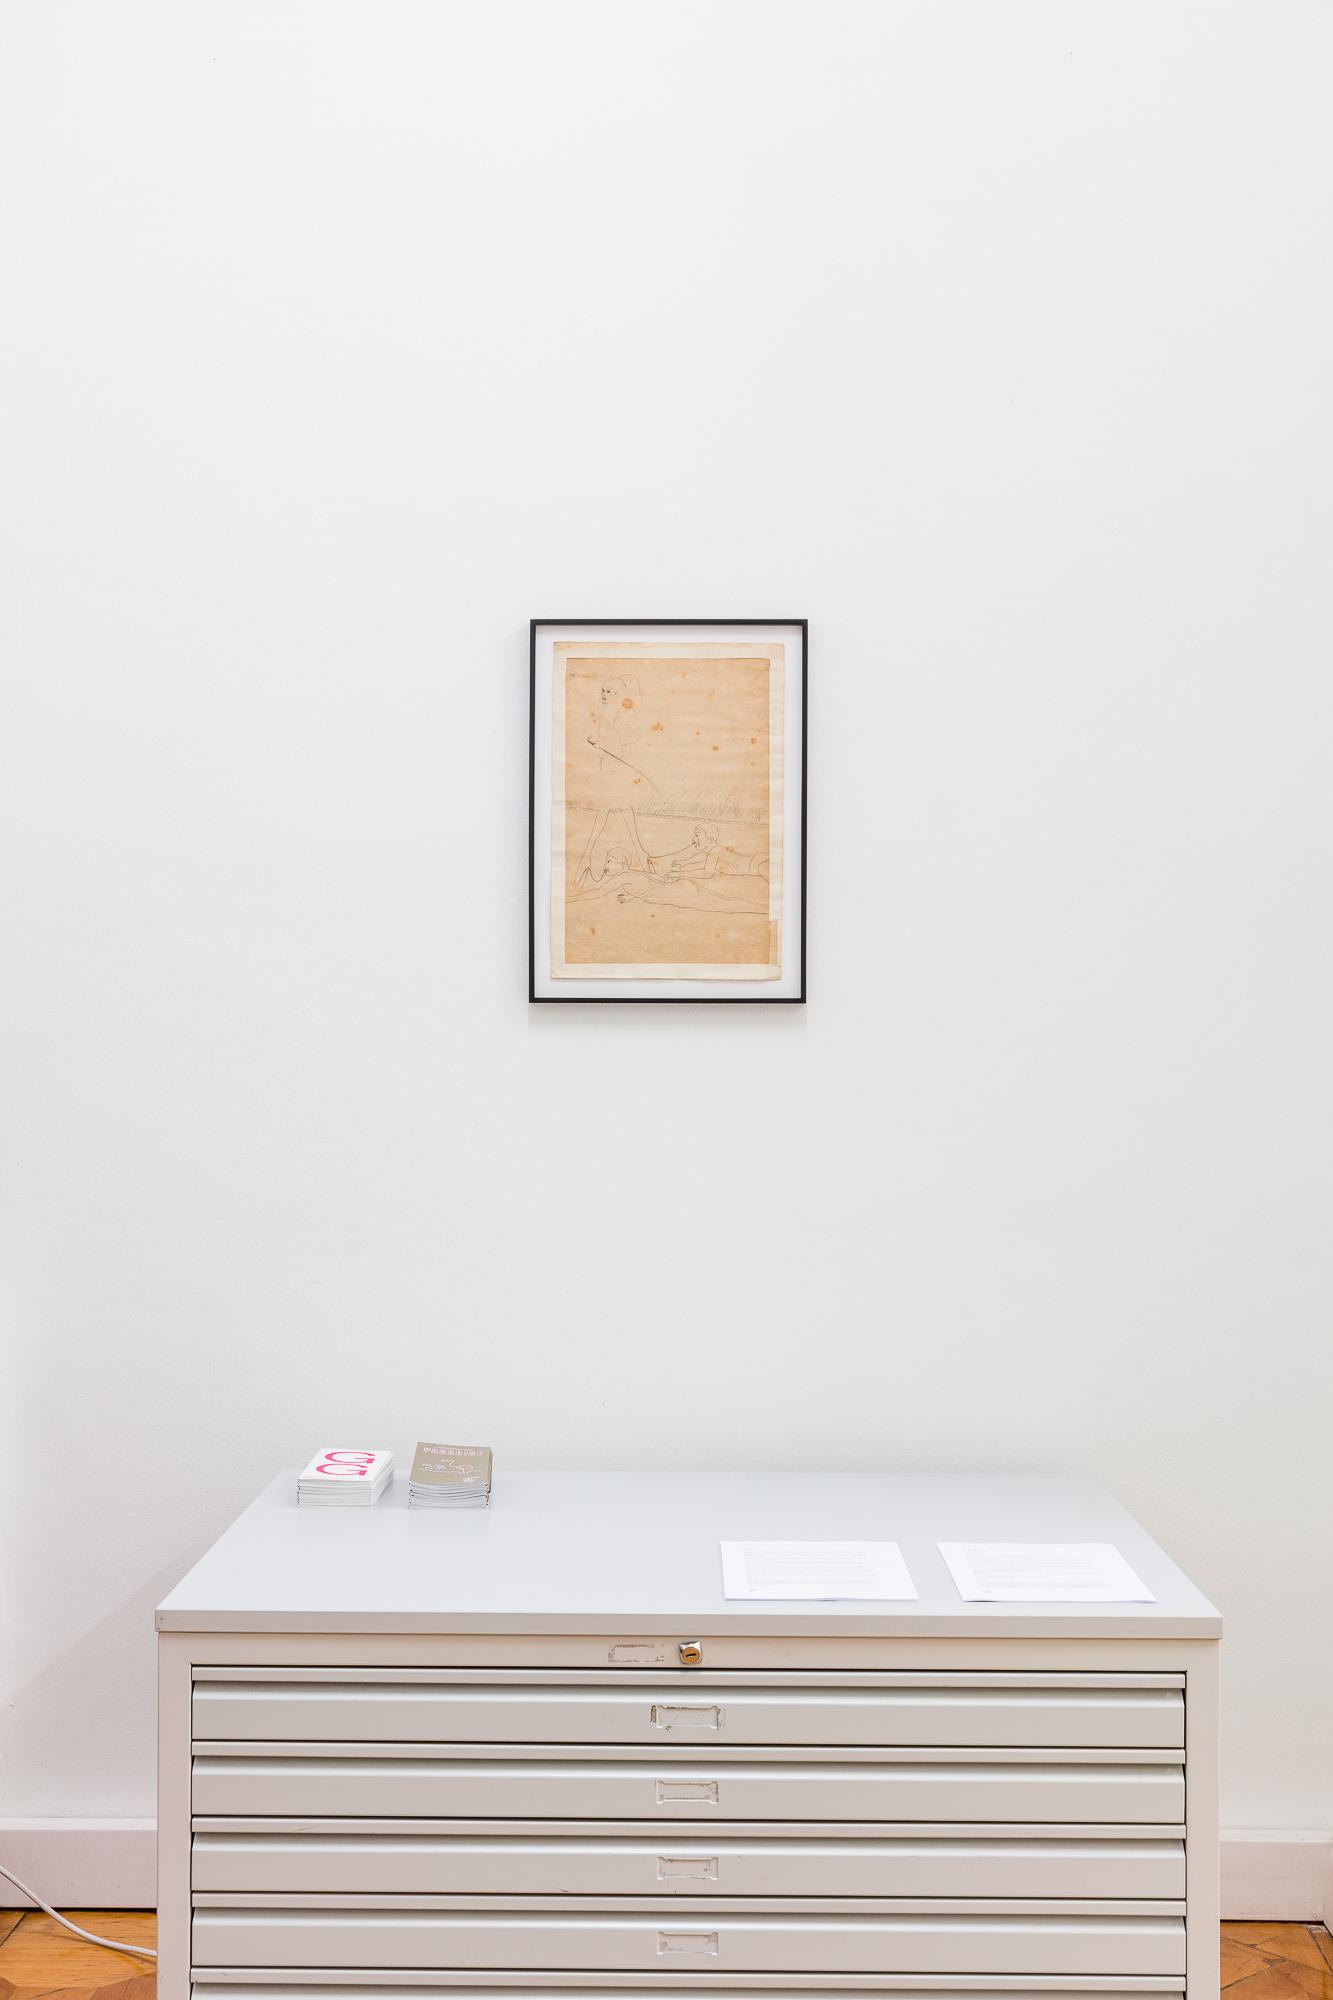 2018_11_22_Zoe Barcza & Soshiro Matsubara at Croy Nielsen by kunstdokumentationcom_006_web.jpg